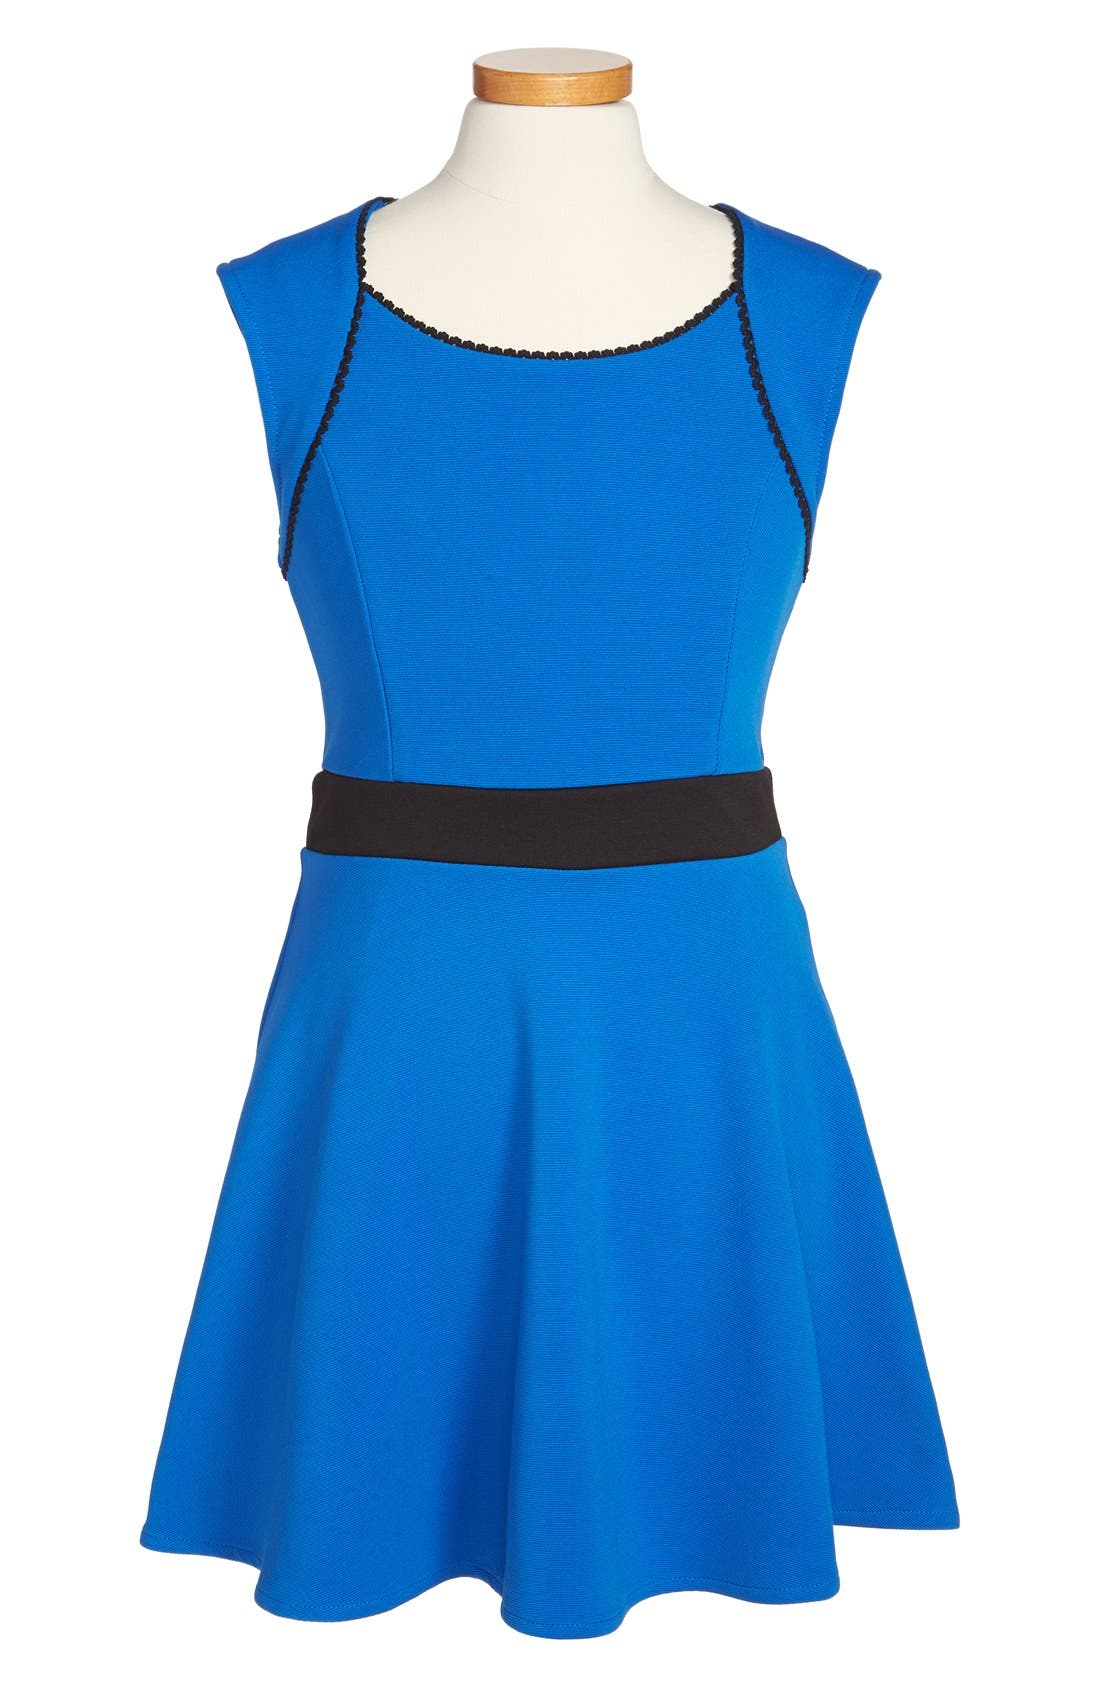 Alternate Image 1 Selected - Sally Miller 'Chloe' Dress (Big Girls)